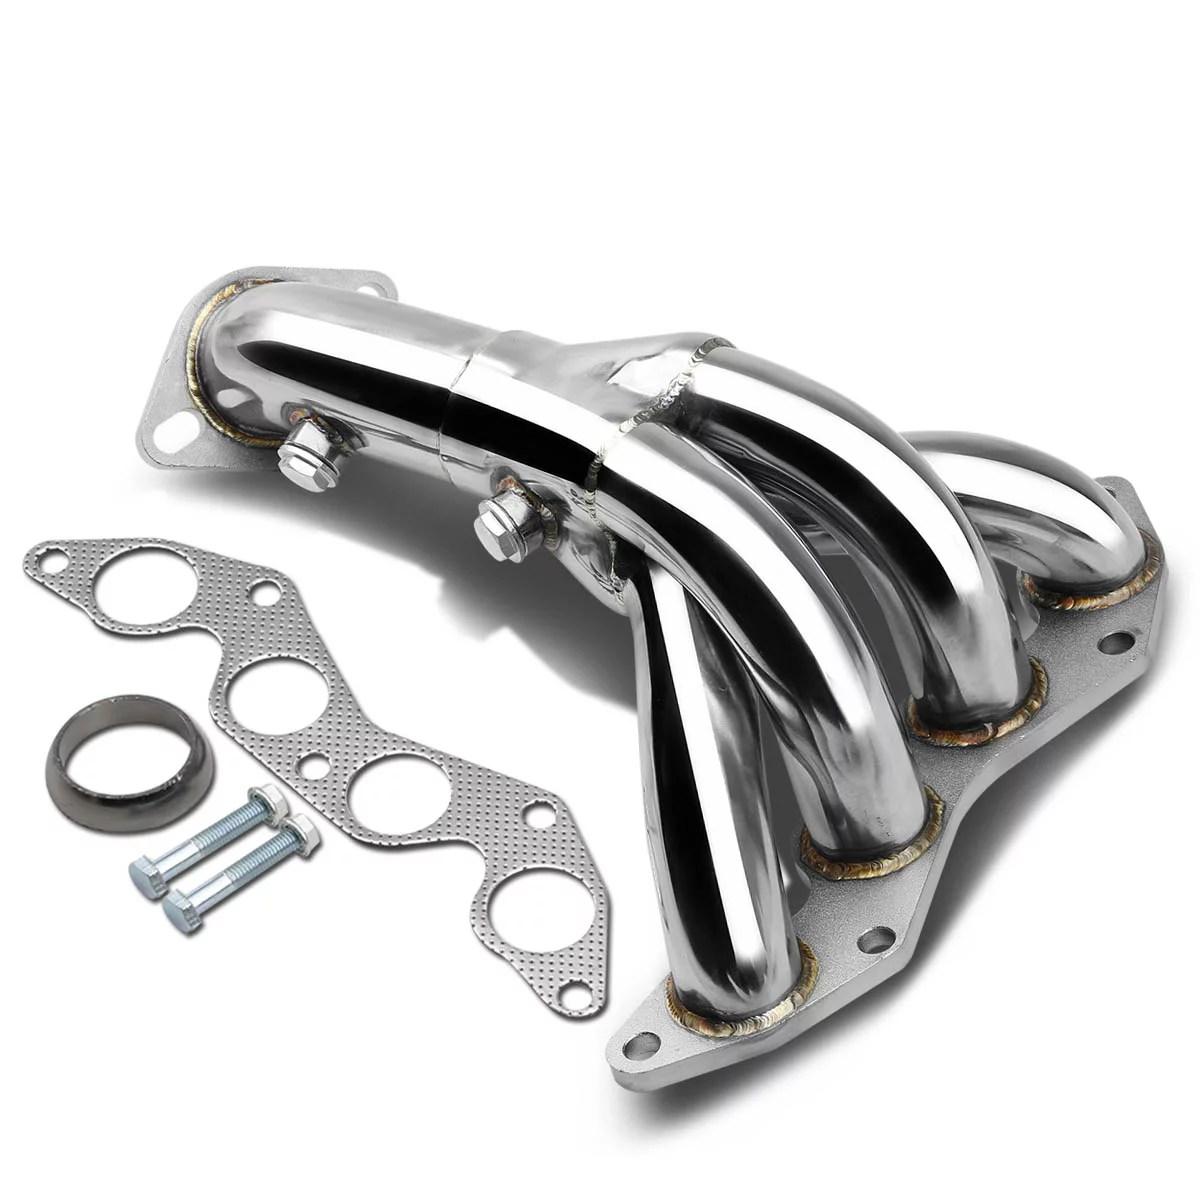 for 2001 to 2005 honda civic 4 1 design stainless steel exhaust header kit 7 gen em es d17a1 engine 02 03 04